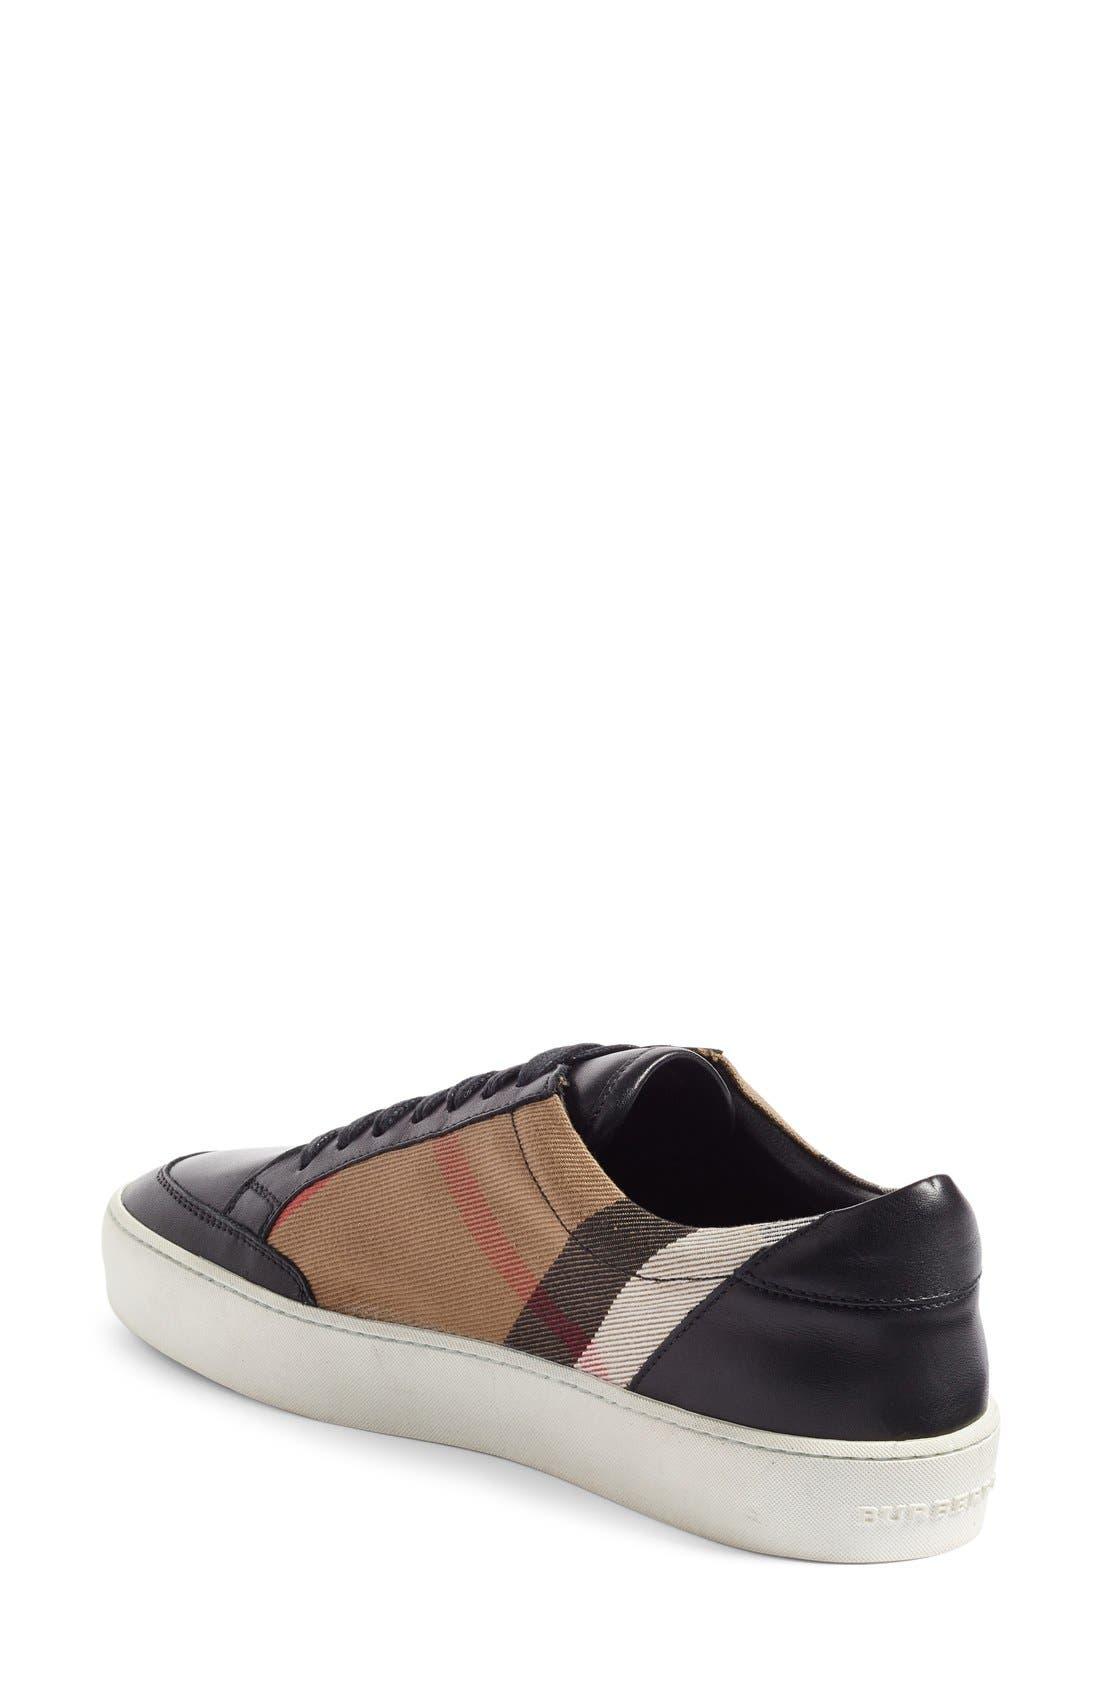 Alternate Image 2  - Burberry Salmond Sneaker (Women)